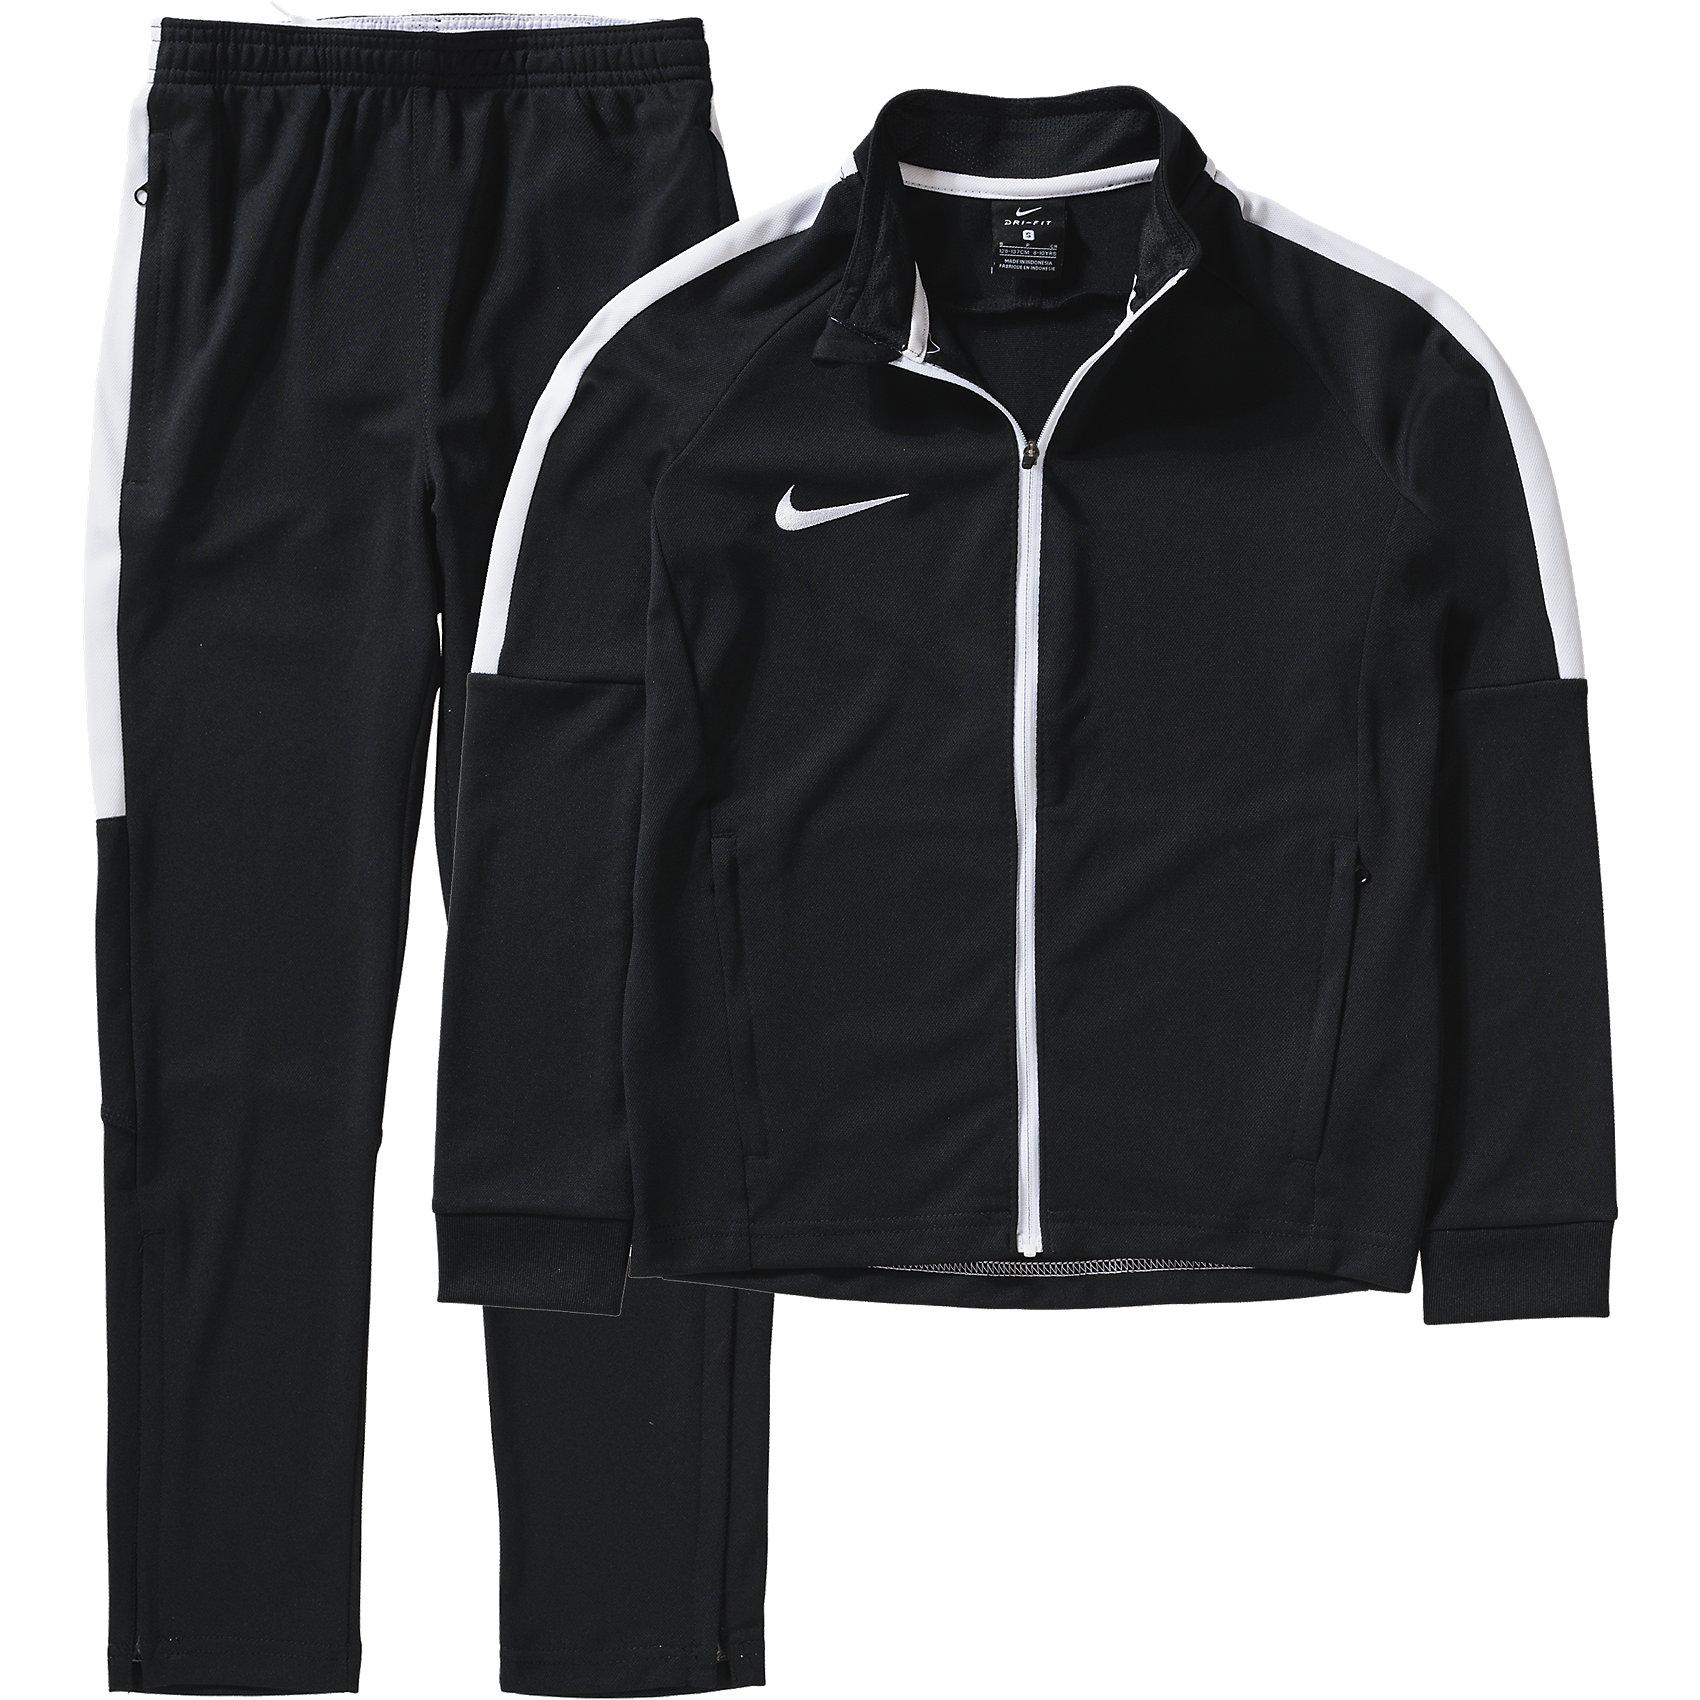 Спортивный костюм NIKEСпортивная одежда<br>Спортивный костюм NIKE<br><br>Состав:Полиэстер 100%<br><br>Ширина мм: 247<br>Глубина мм: 16<br>Высота мм: 140<br>Вес г: 225<br>Цвет: синий<br>Возраст от месяцев: 168<br>Возраст до месяцев: 180<br>Пол: Унисекс<br>Возраст: Детский<br>Размер: 158/170<br>SKU: 6681970